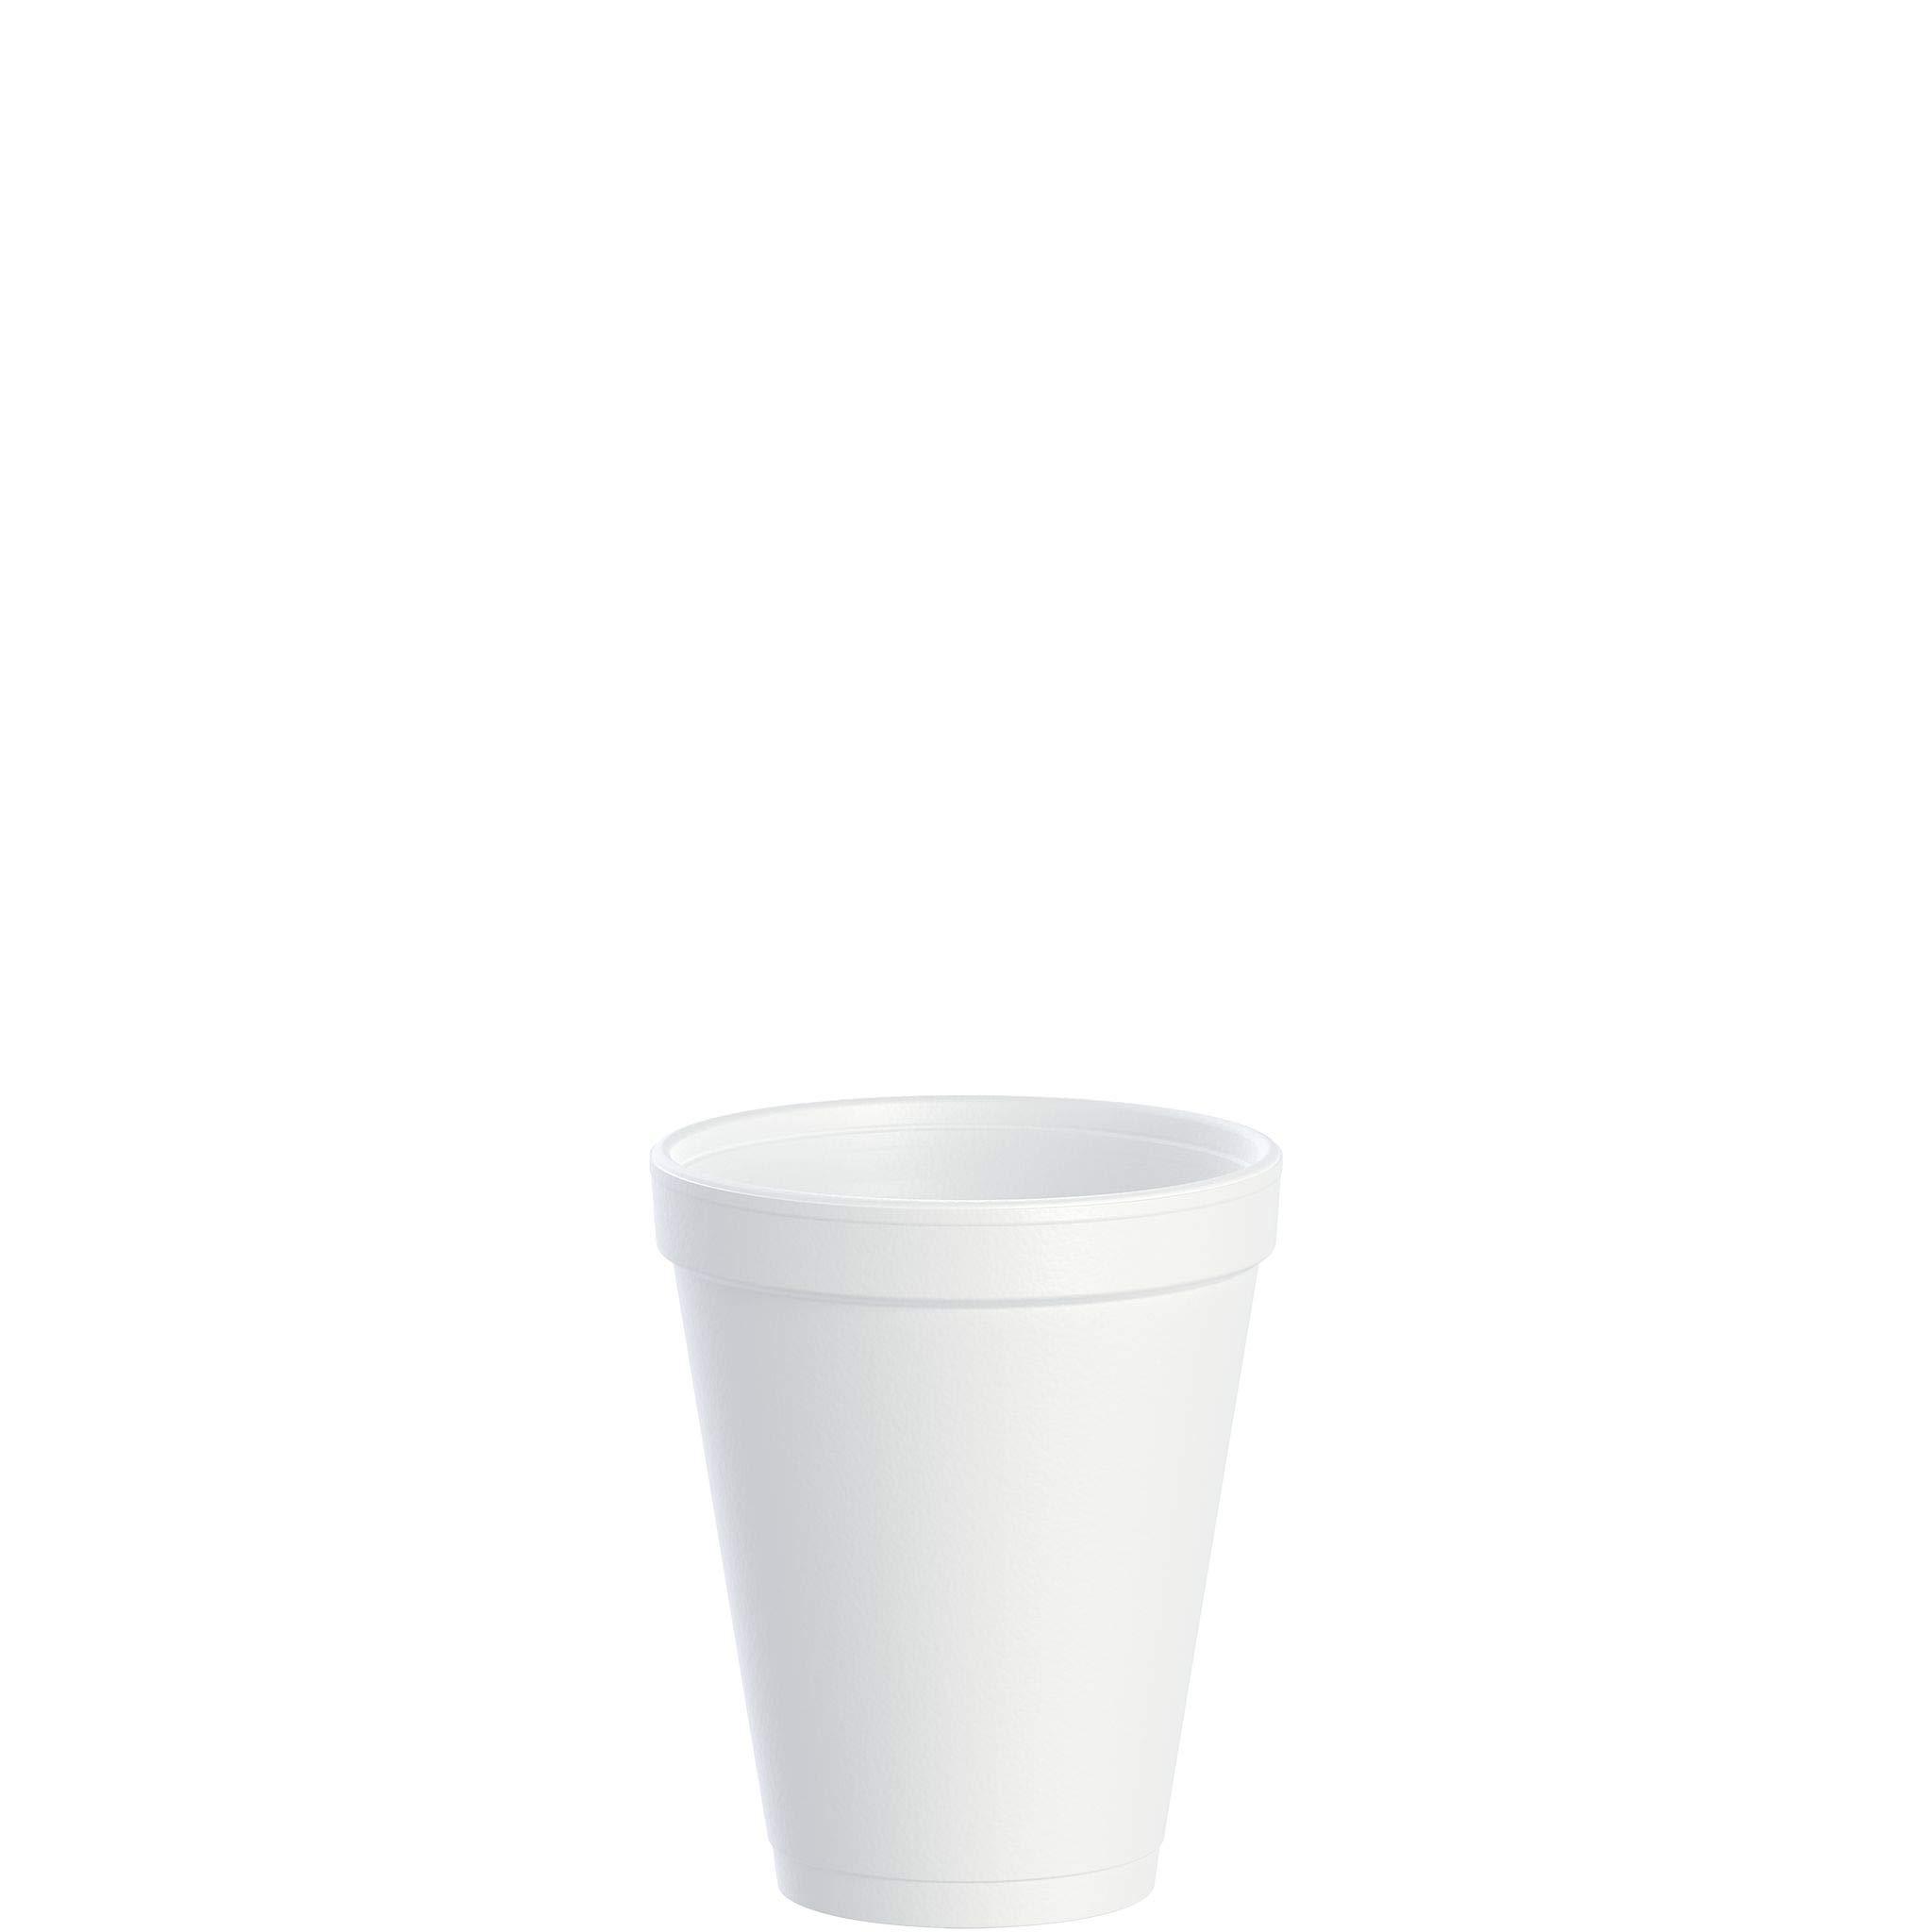 Dart DRC10J10 Styrofoam Insulated Foam Cups, 10 oz, Carton of 1000(40 packs of 25 cups) by DART